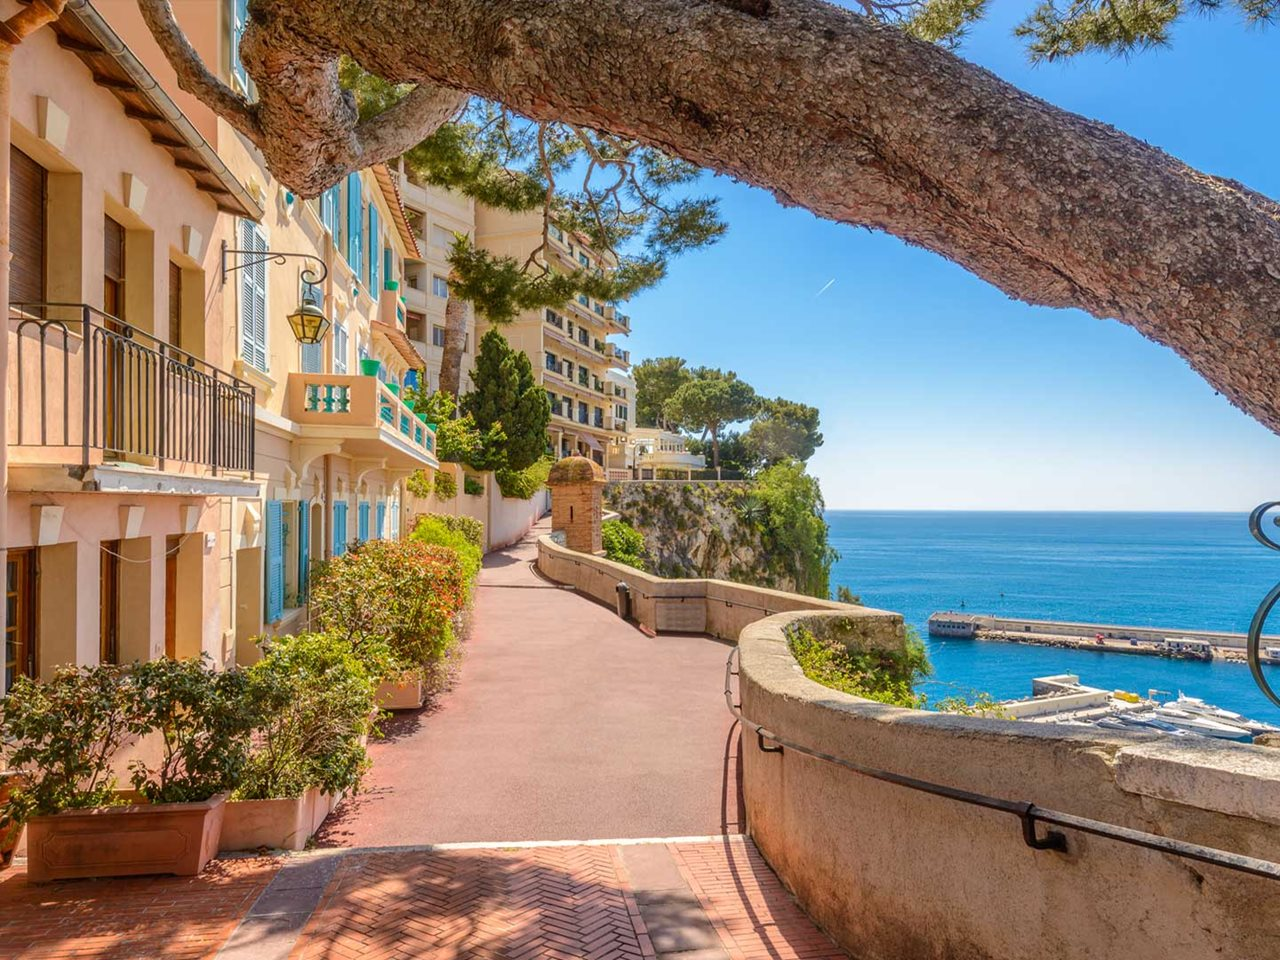 Excursiereis 8 dagen Italiaanse Bloemenrivièra en Côte d'Azur